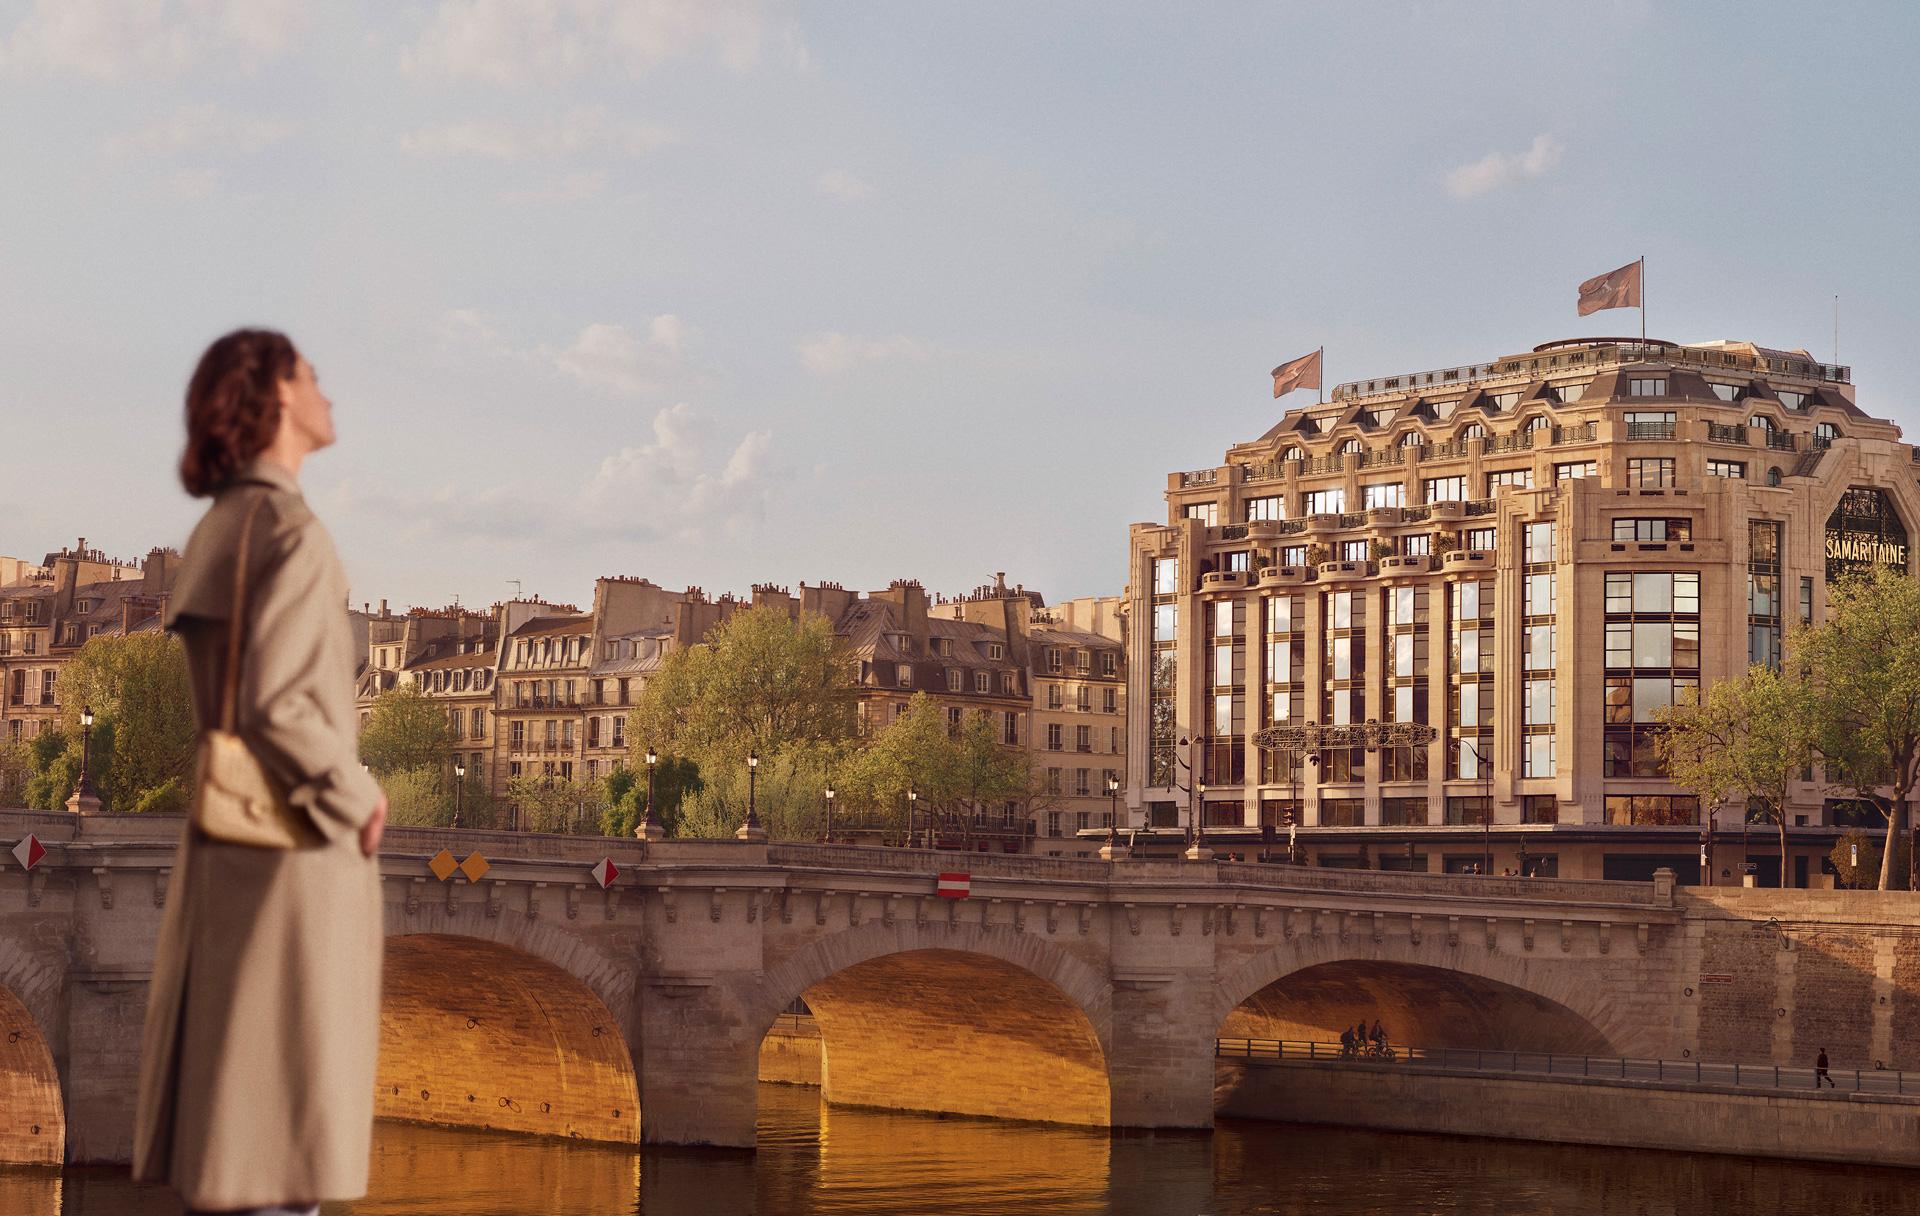 Cheval Blanc Paris, Luxury Hotel France, Suite Quintessence Bathroom, Casol